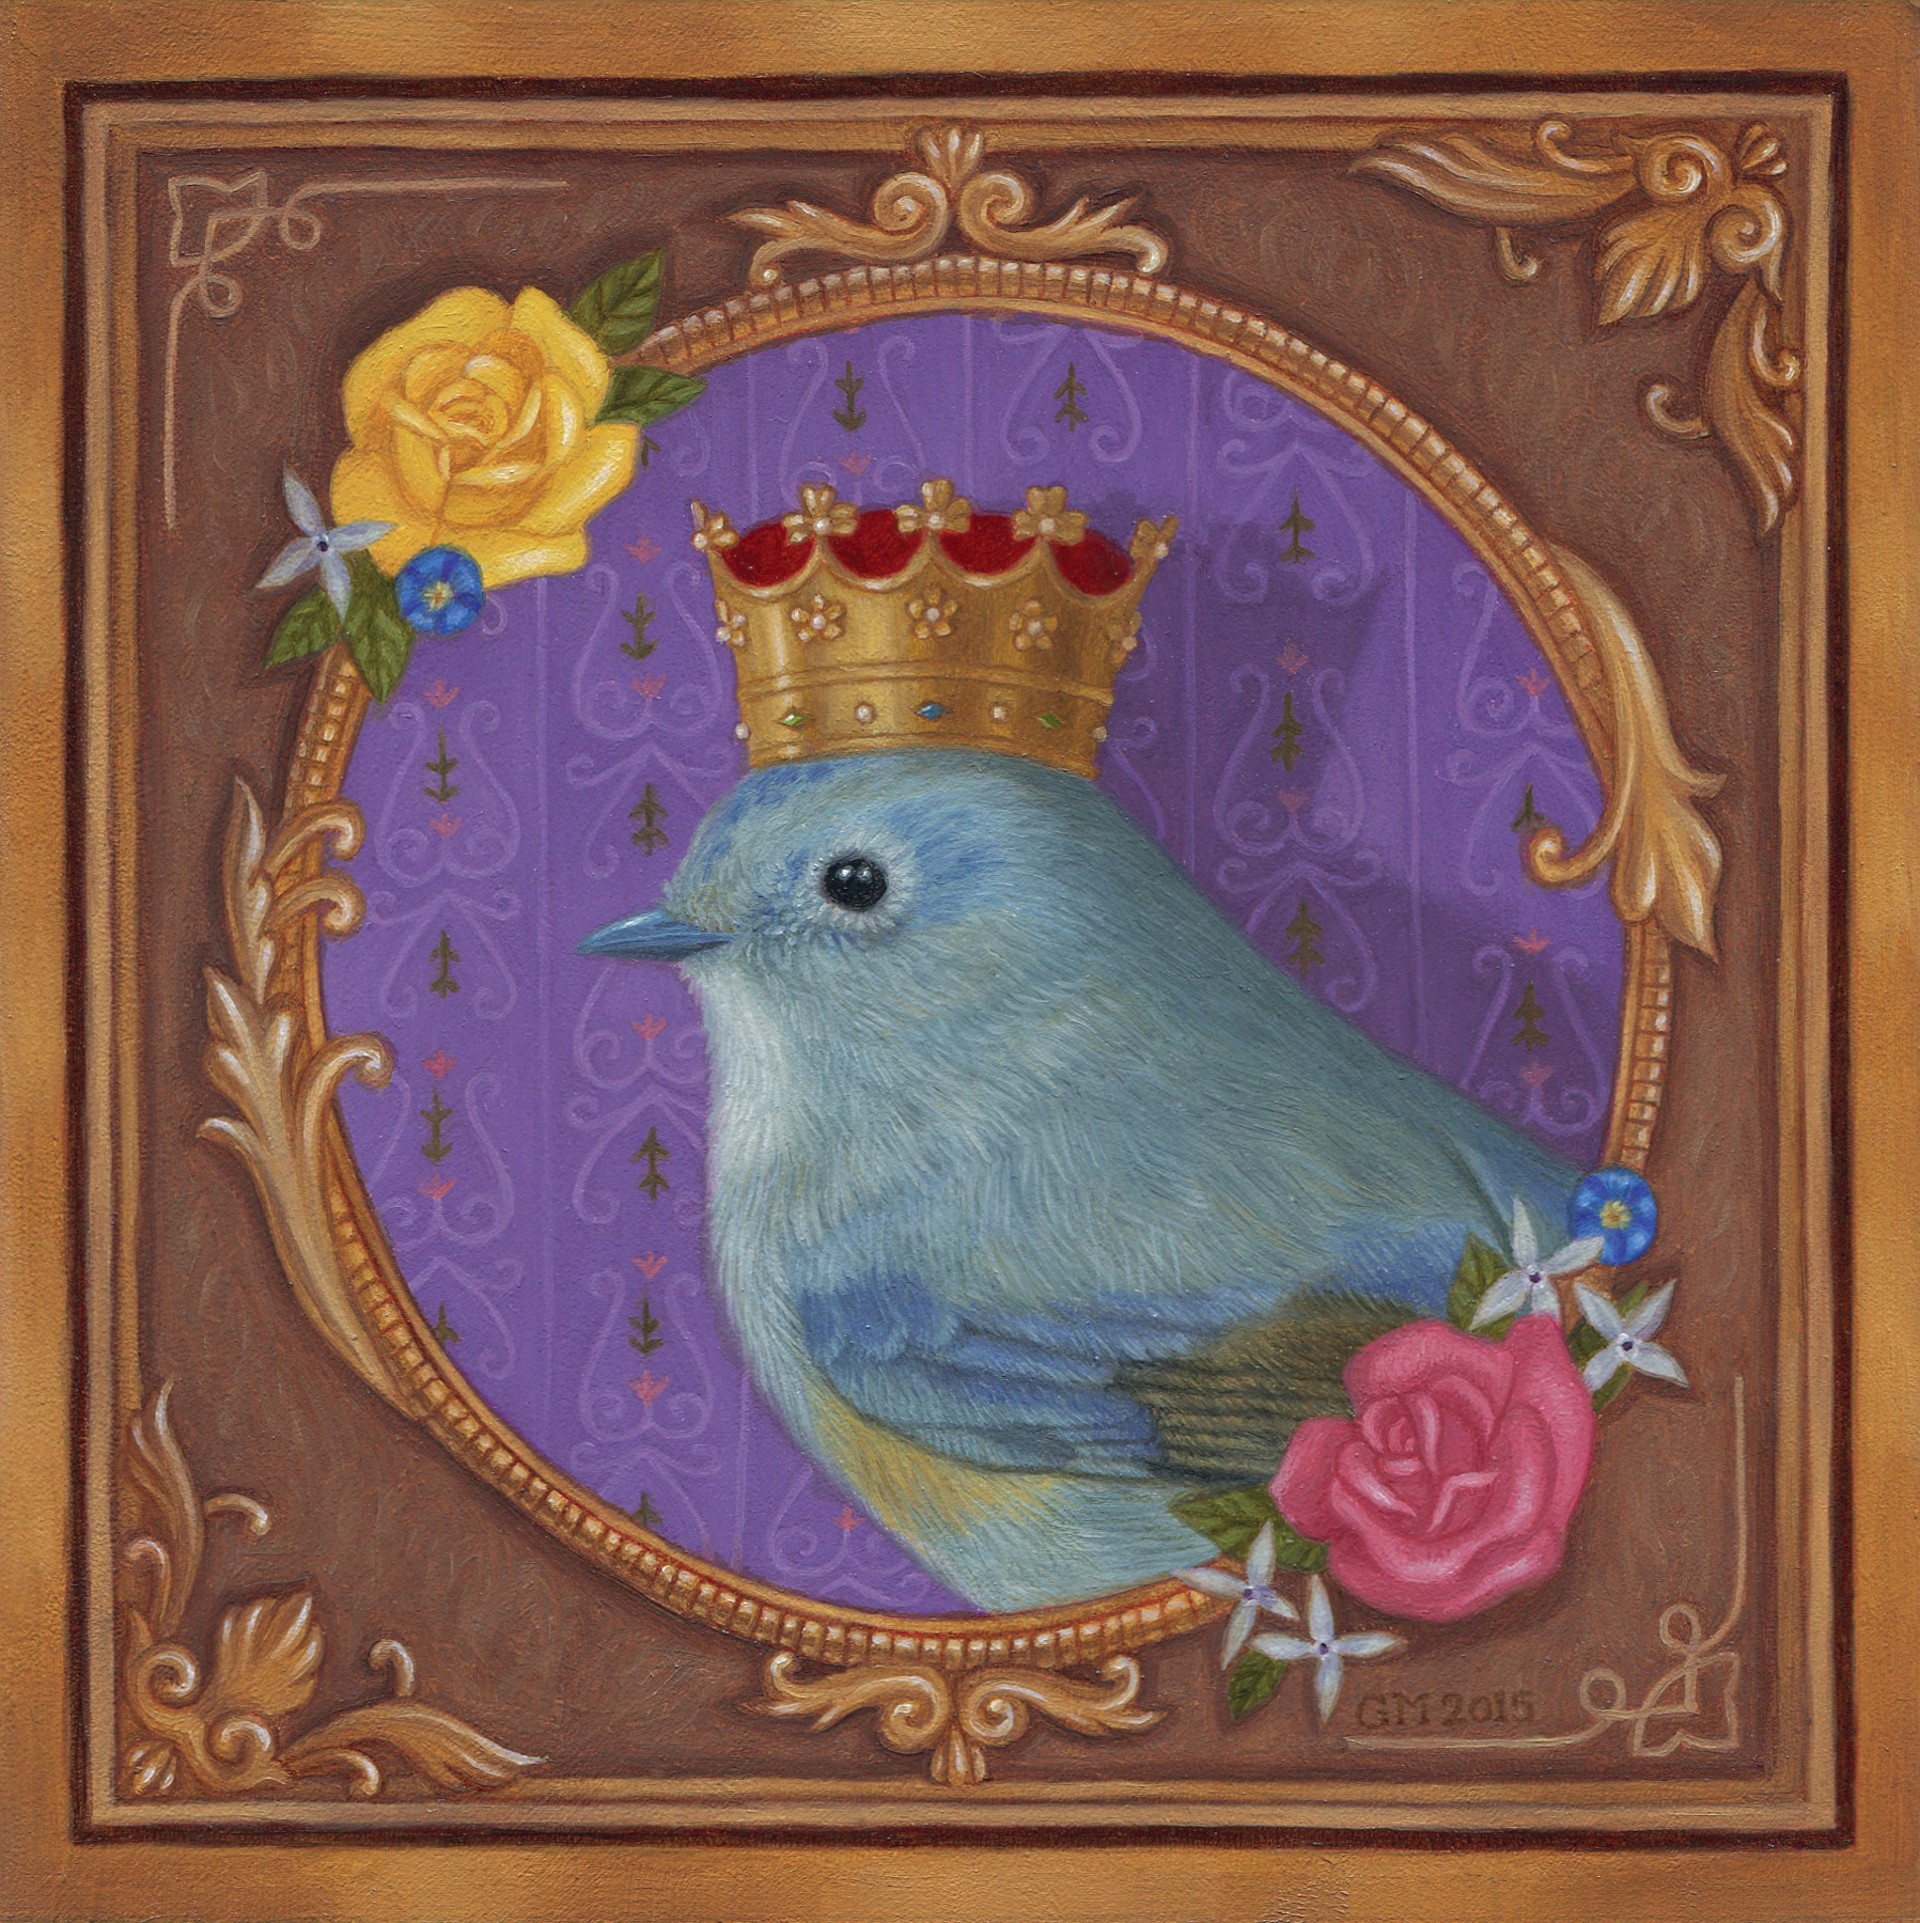 Queen Birdy by Gina Matarazzo